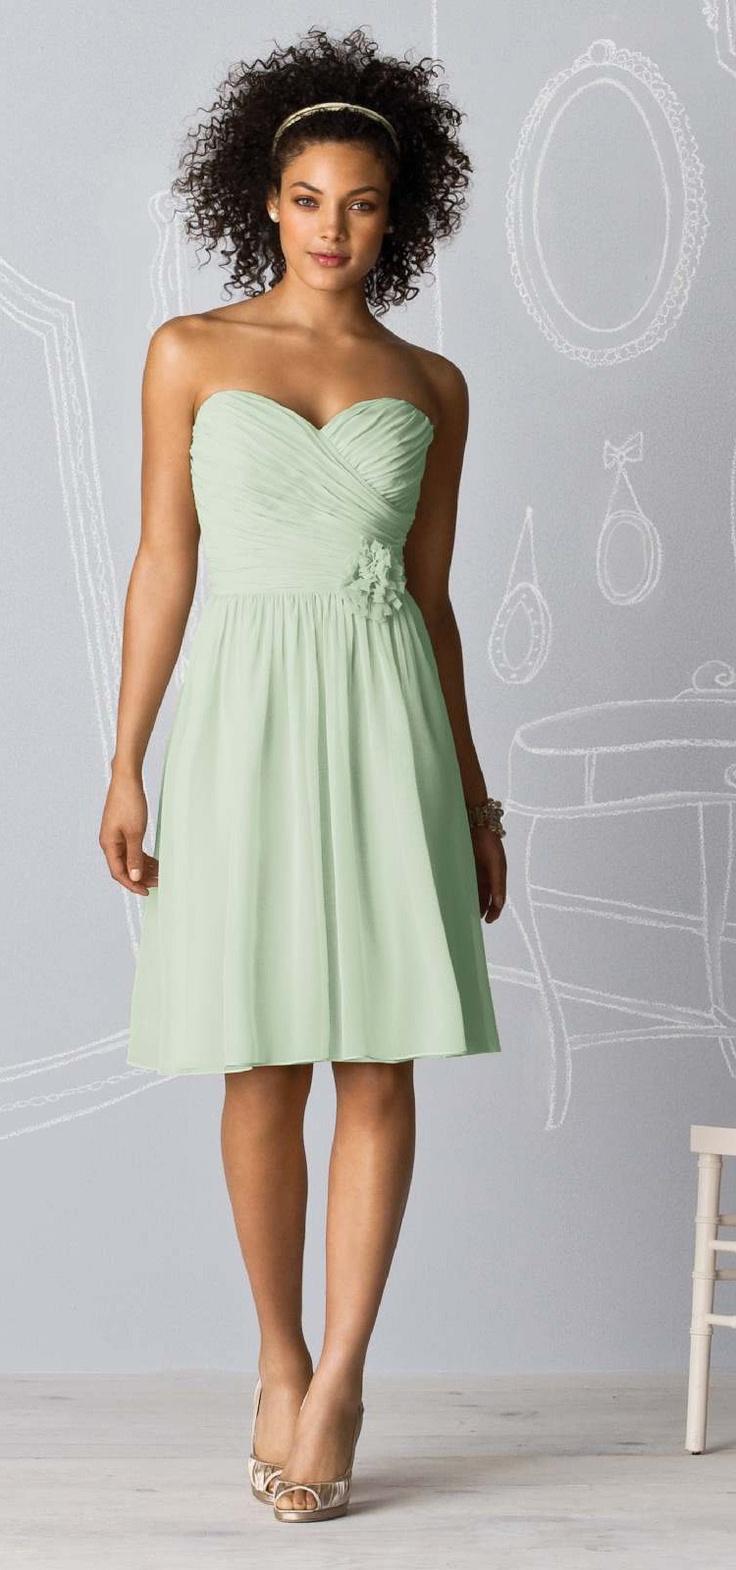 67 best celadon green wedding inspiration images on pinterest celadon green bridesmaid dress by weddington way ombrellifo Choice Image